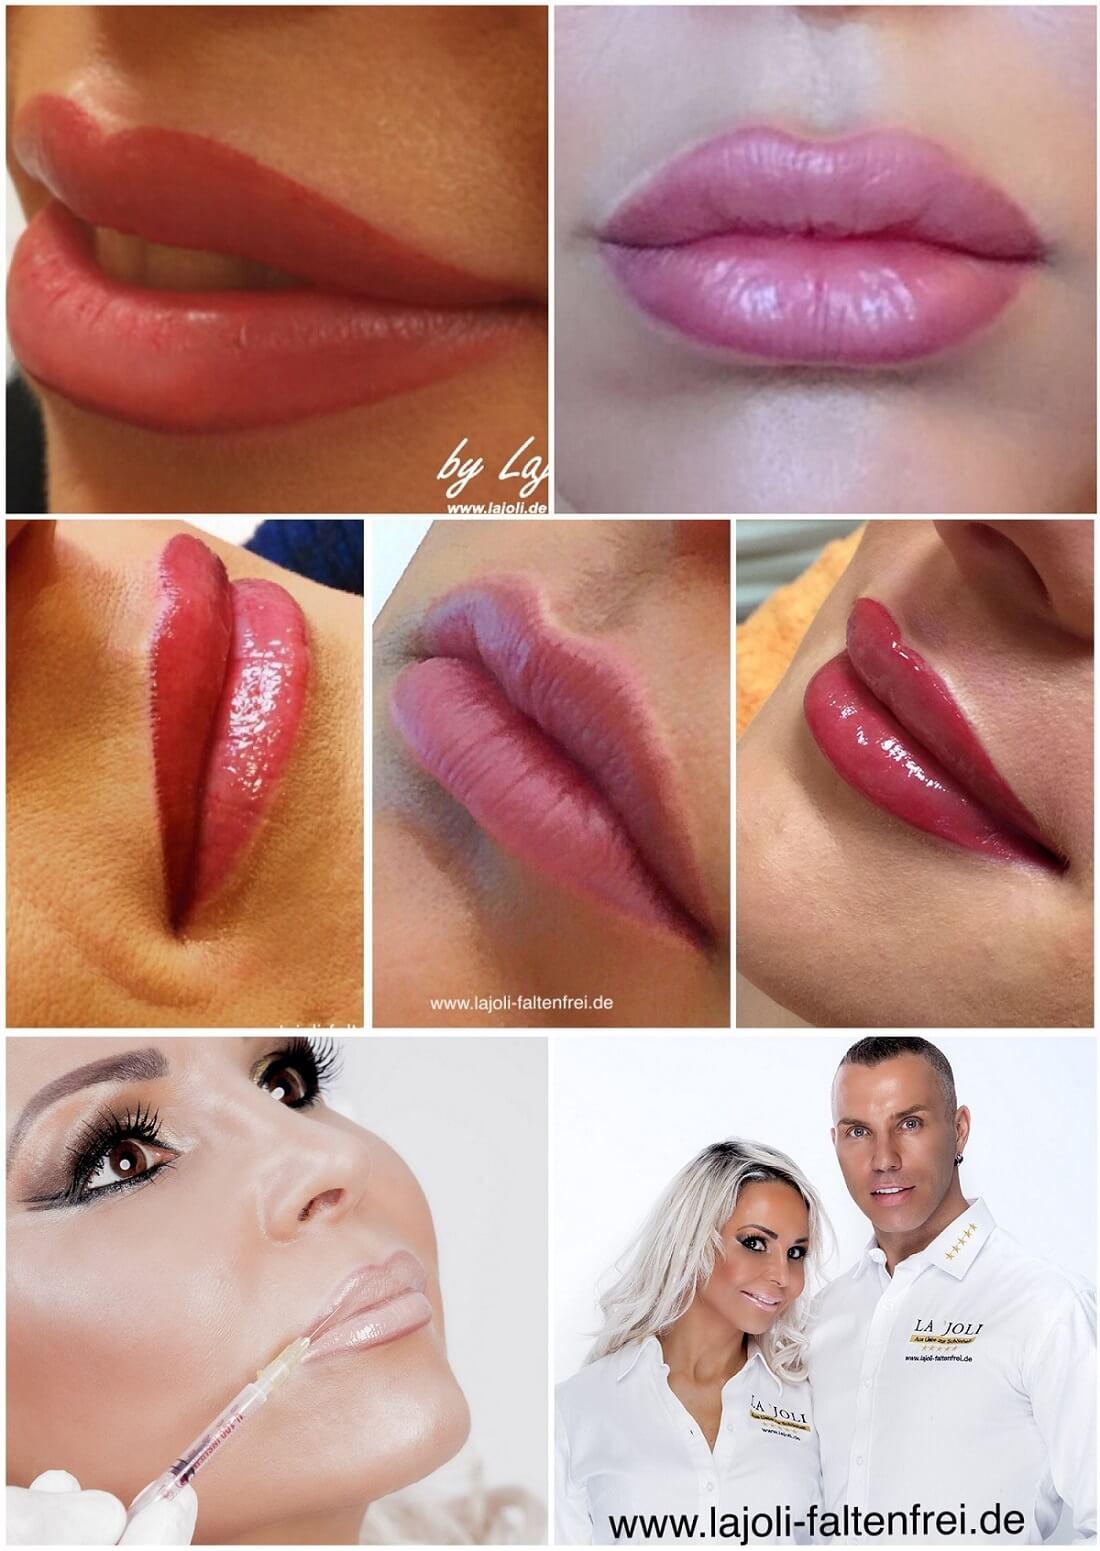 Lippen Modellierung mit Hyaluronsäure - LAJOLI Praxis für Ästhetik in Hamburg – Leja – Lippen aufspritzen, Botox, Microneedling